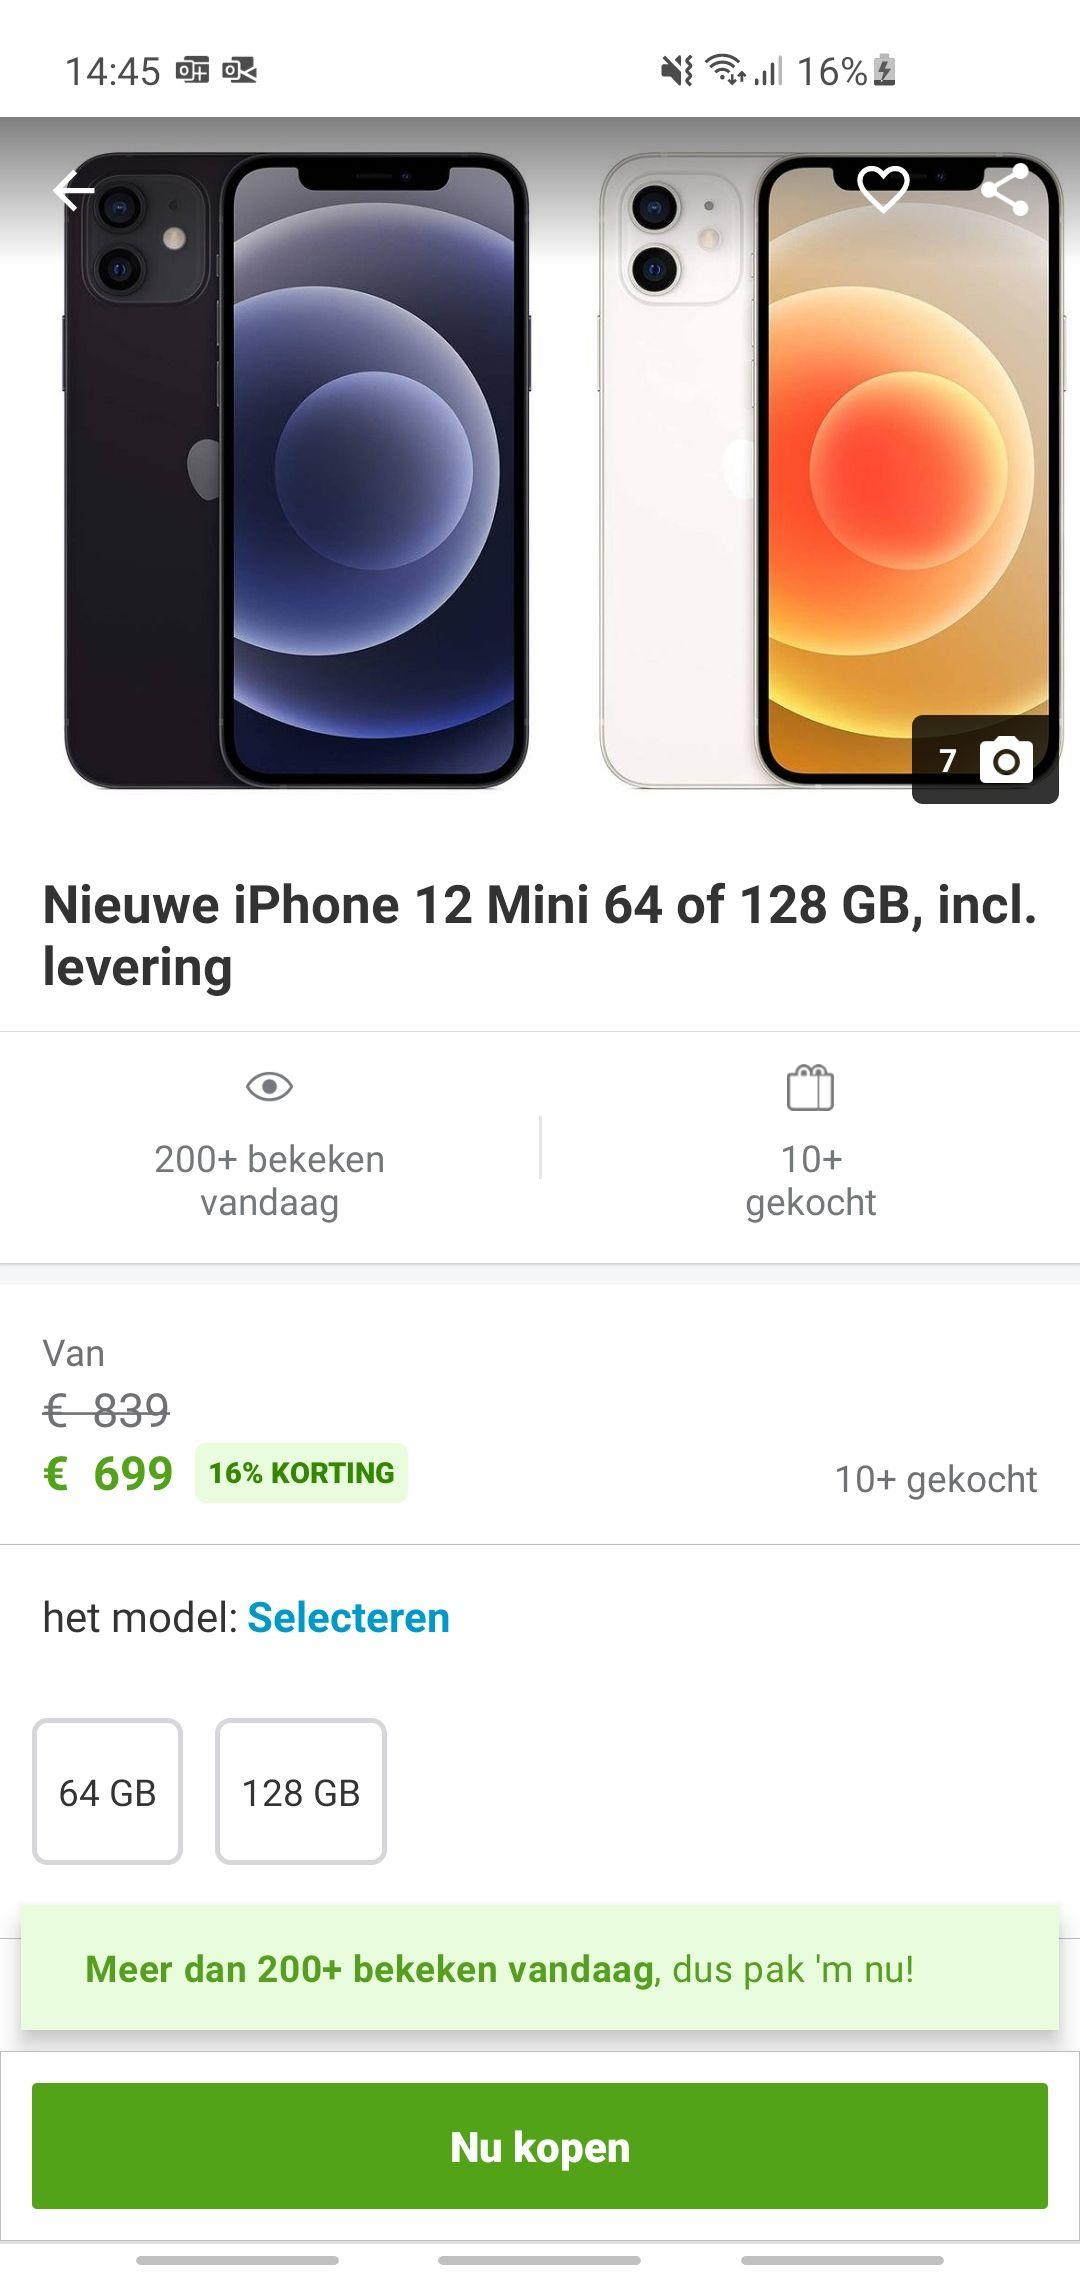 IPhone 12 mini 64gb/128gb via Groupon